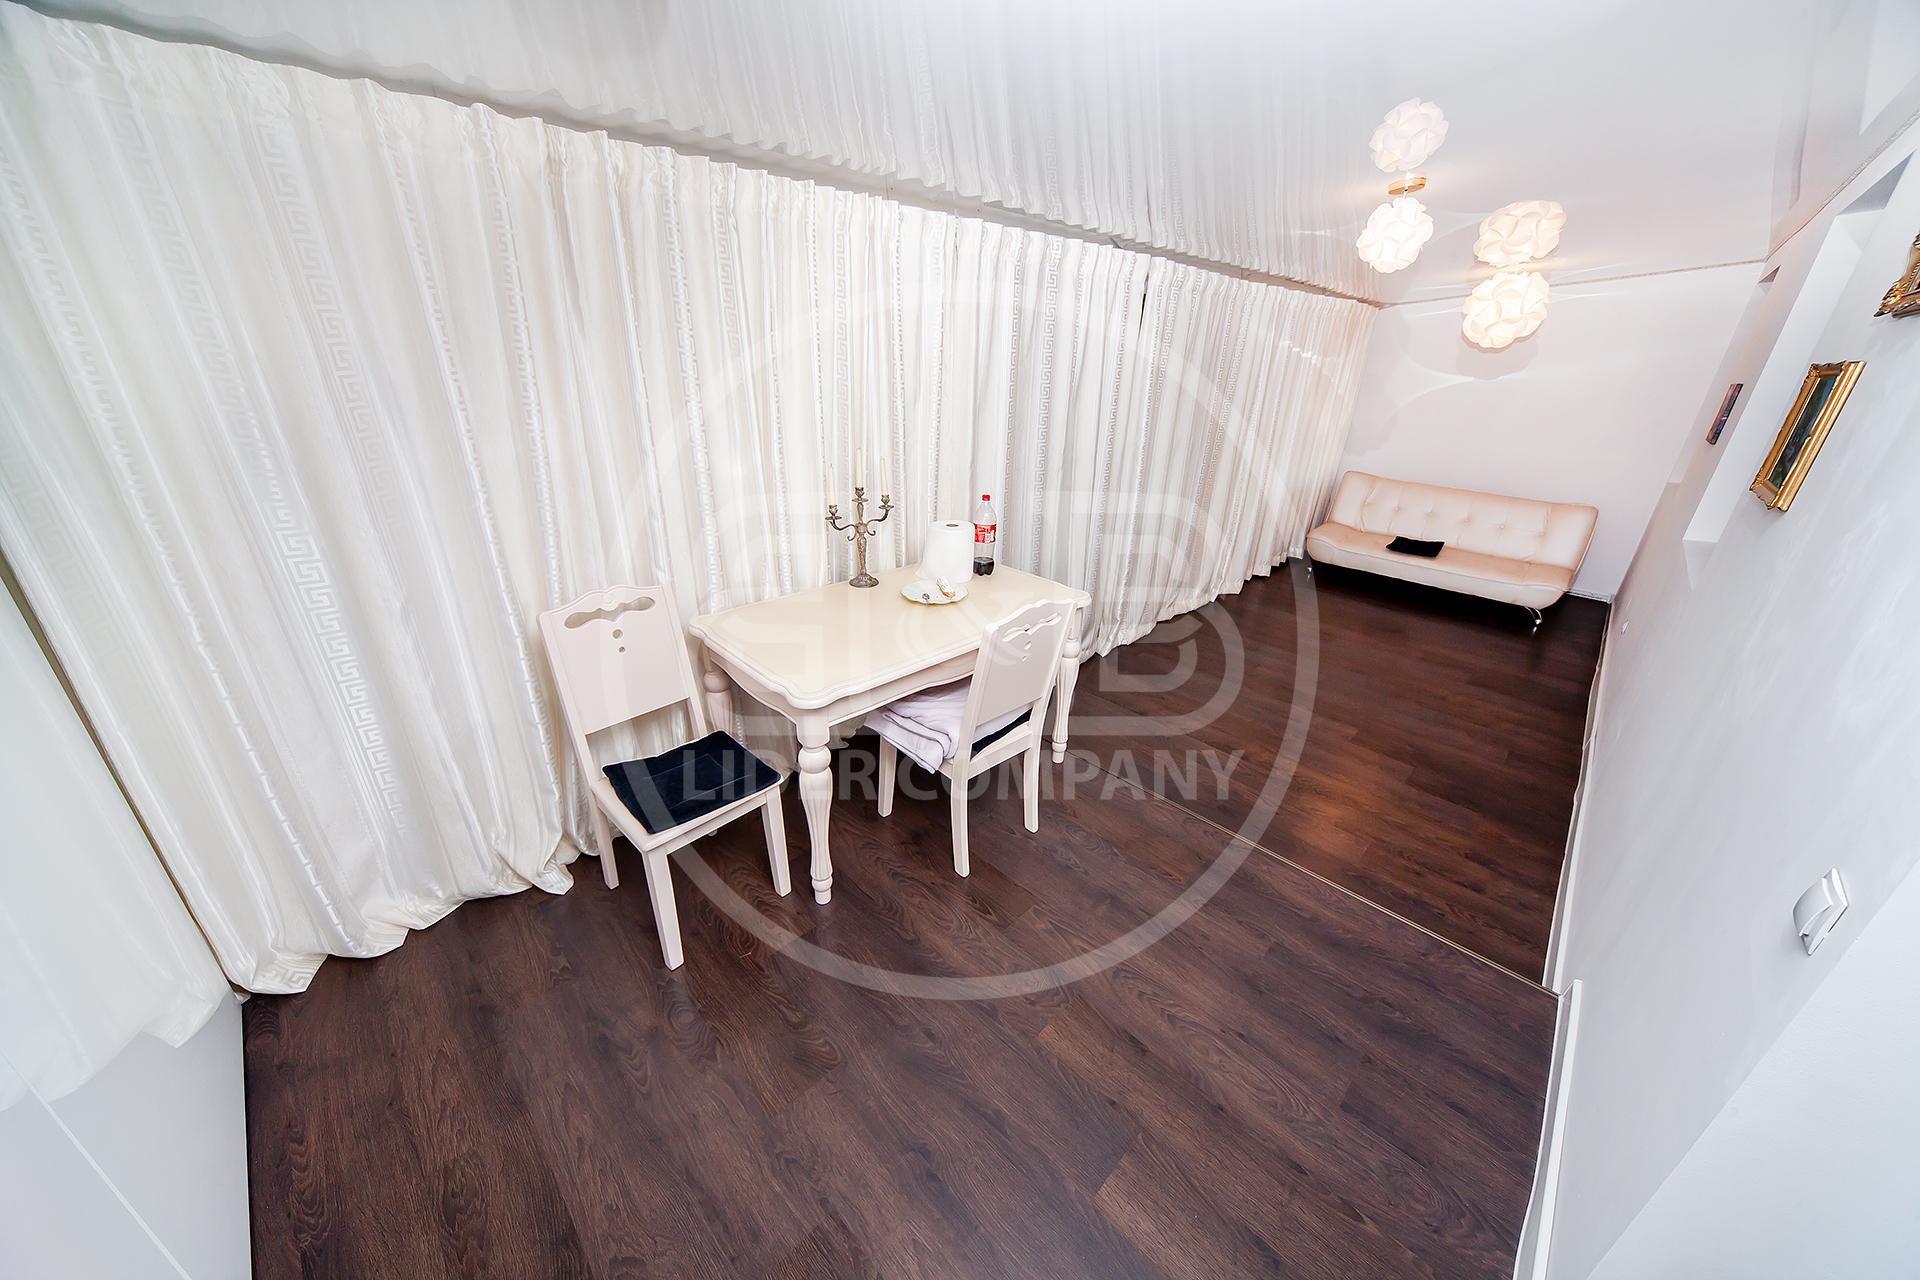 Apartament 3 camere+living! 688 Euro mp ! Prima linie!! Buiucani!!